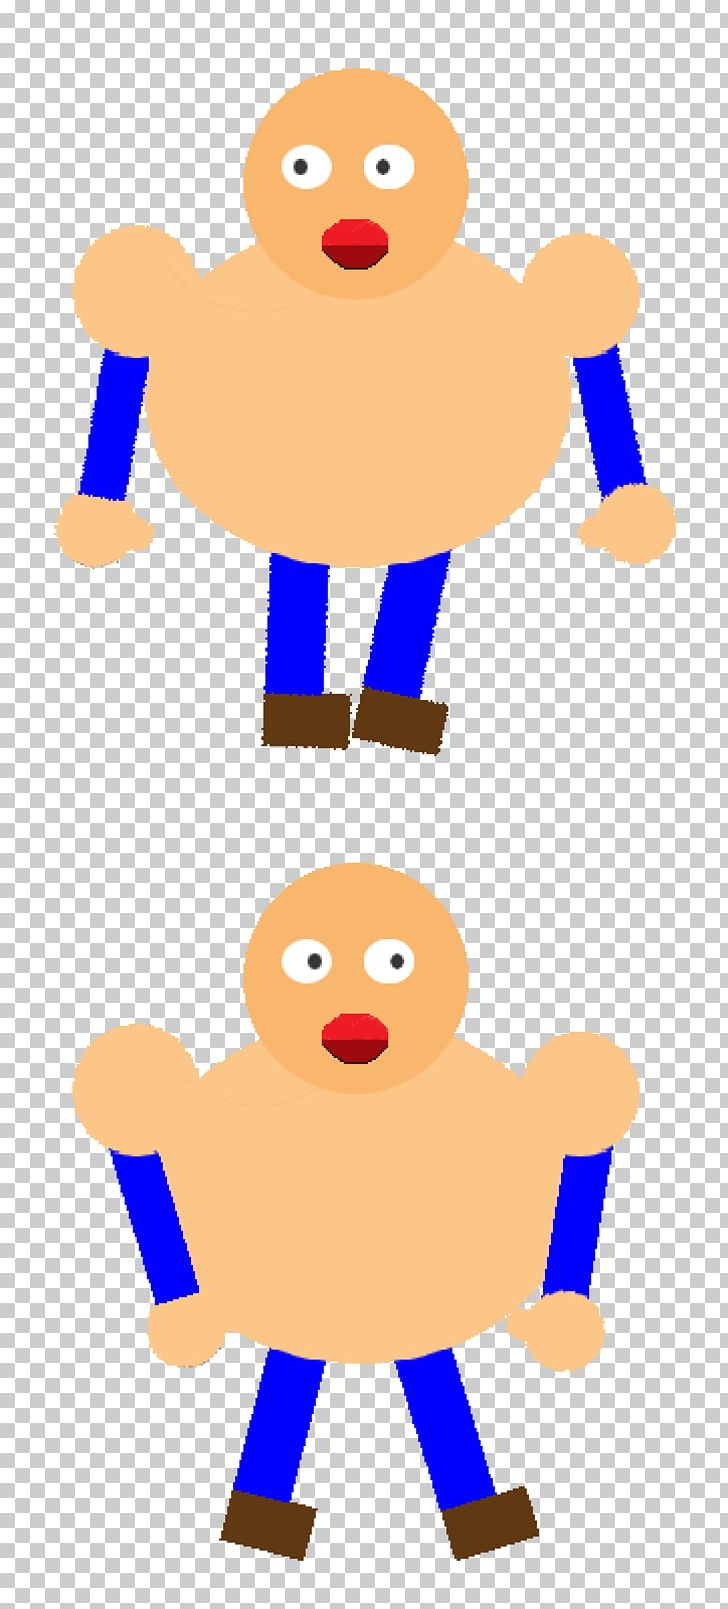 hight resolution of human behavior animation motion png clipart animation art behavior cartoon homo sapiens free png download